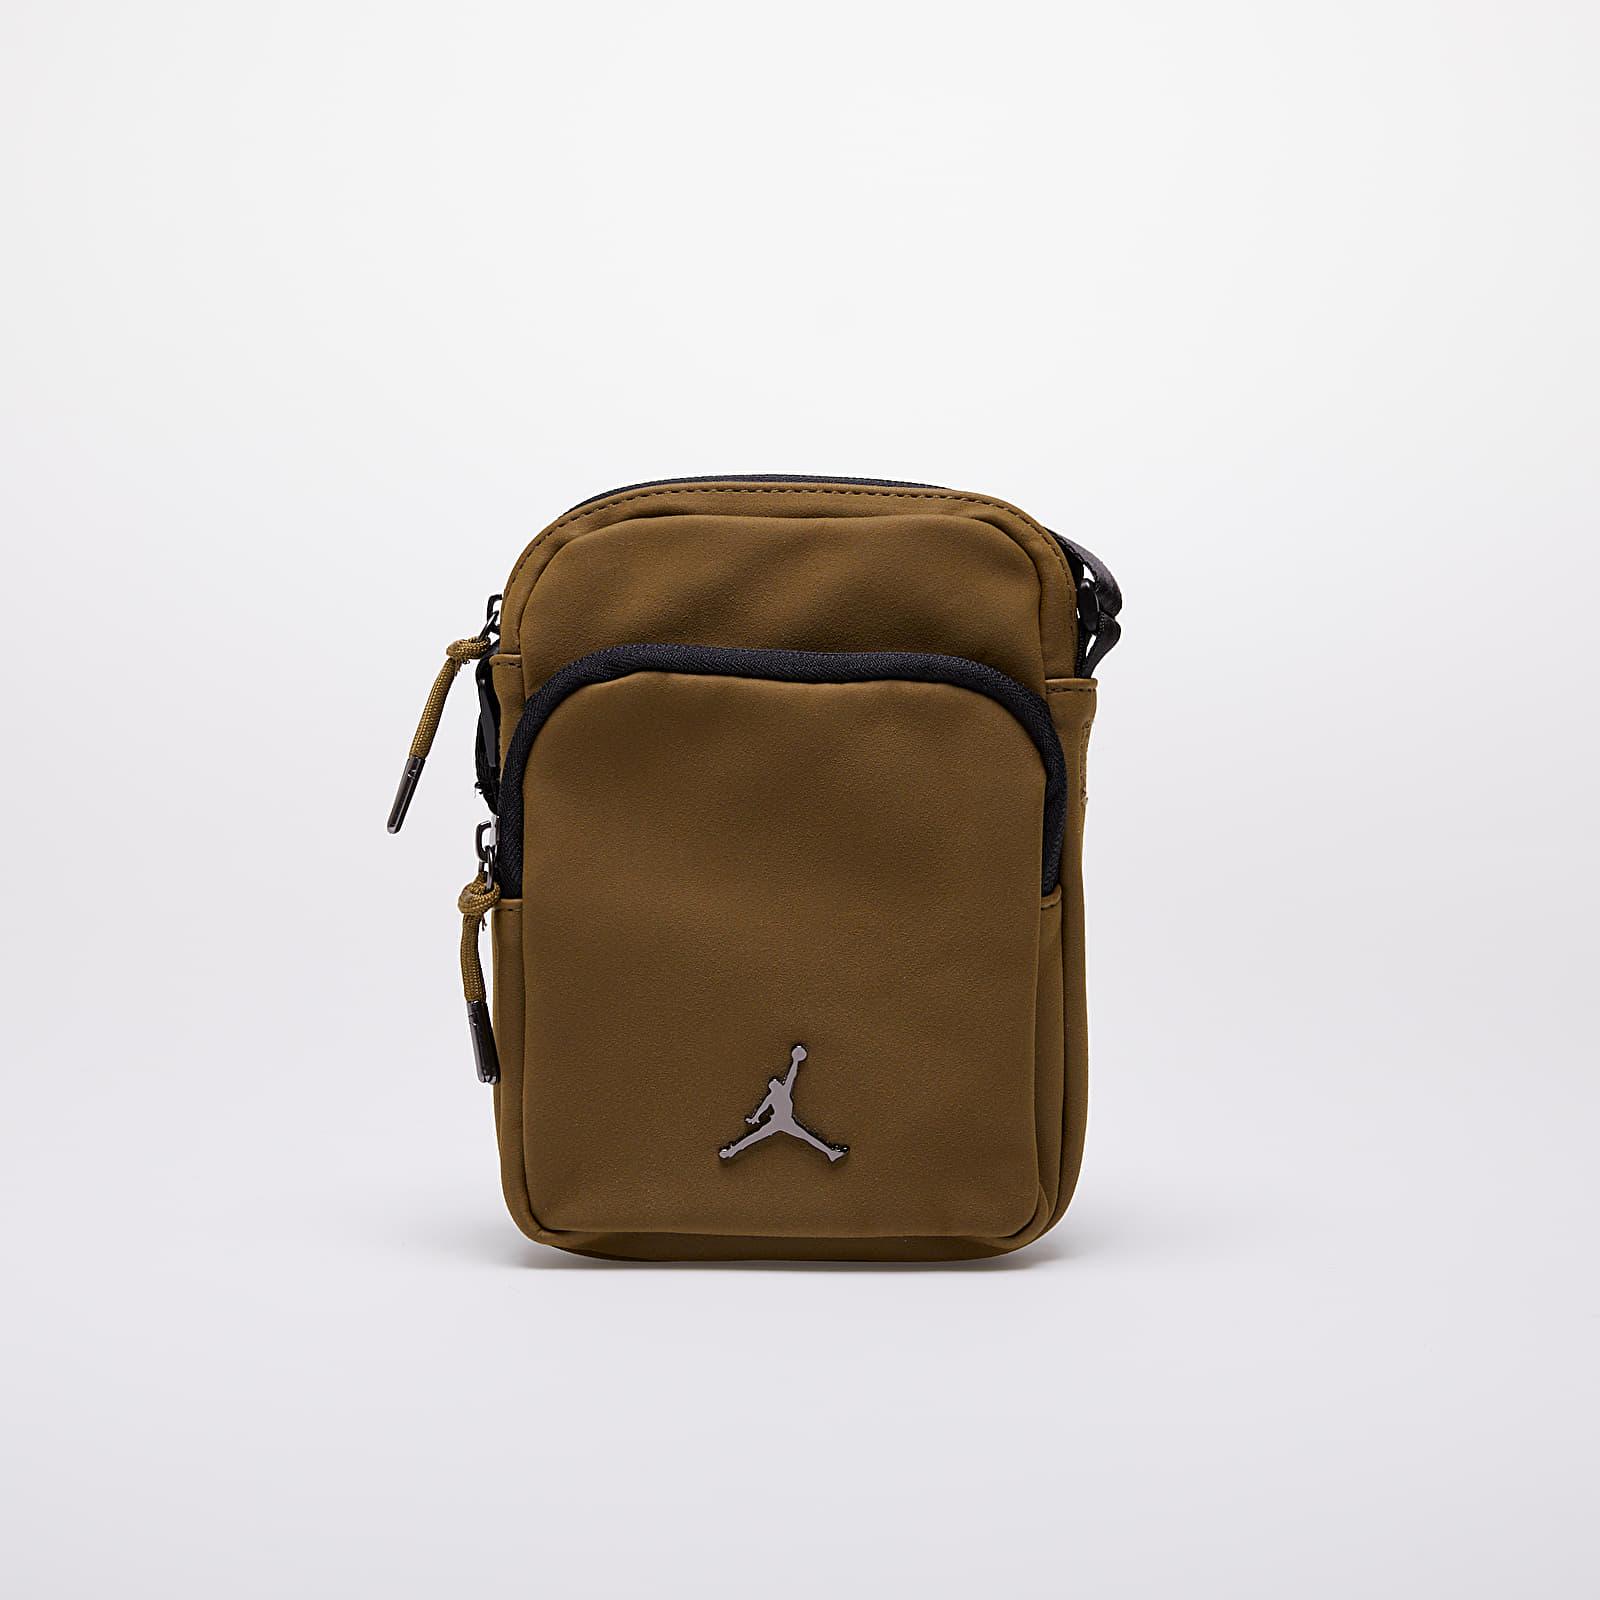 Bags and backpacks Jordan Airborne Suede Crossbody Bag Olive Flak